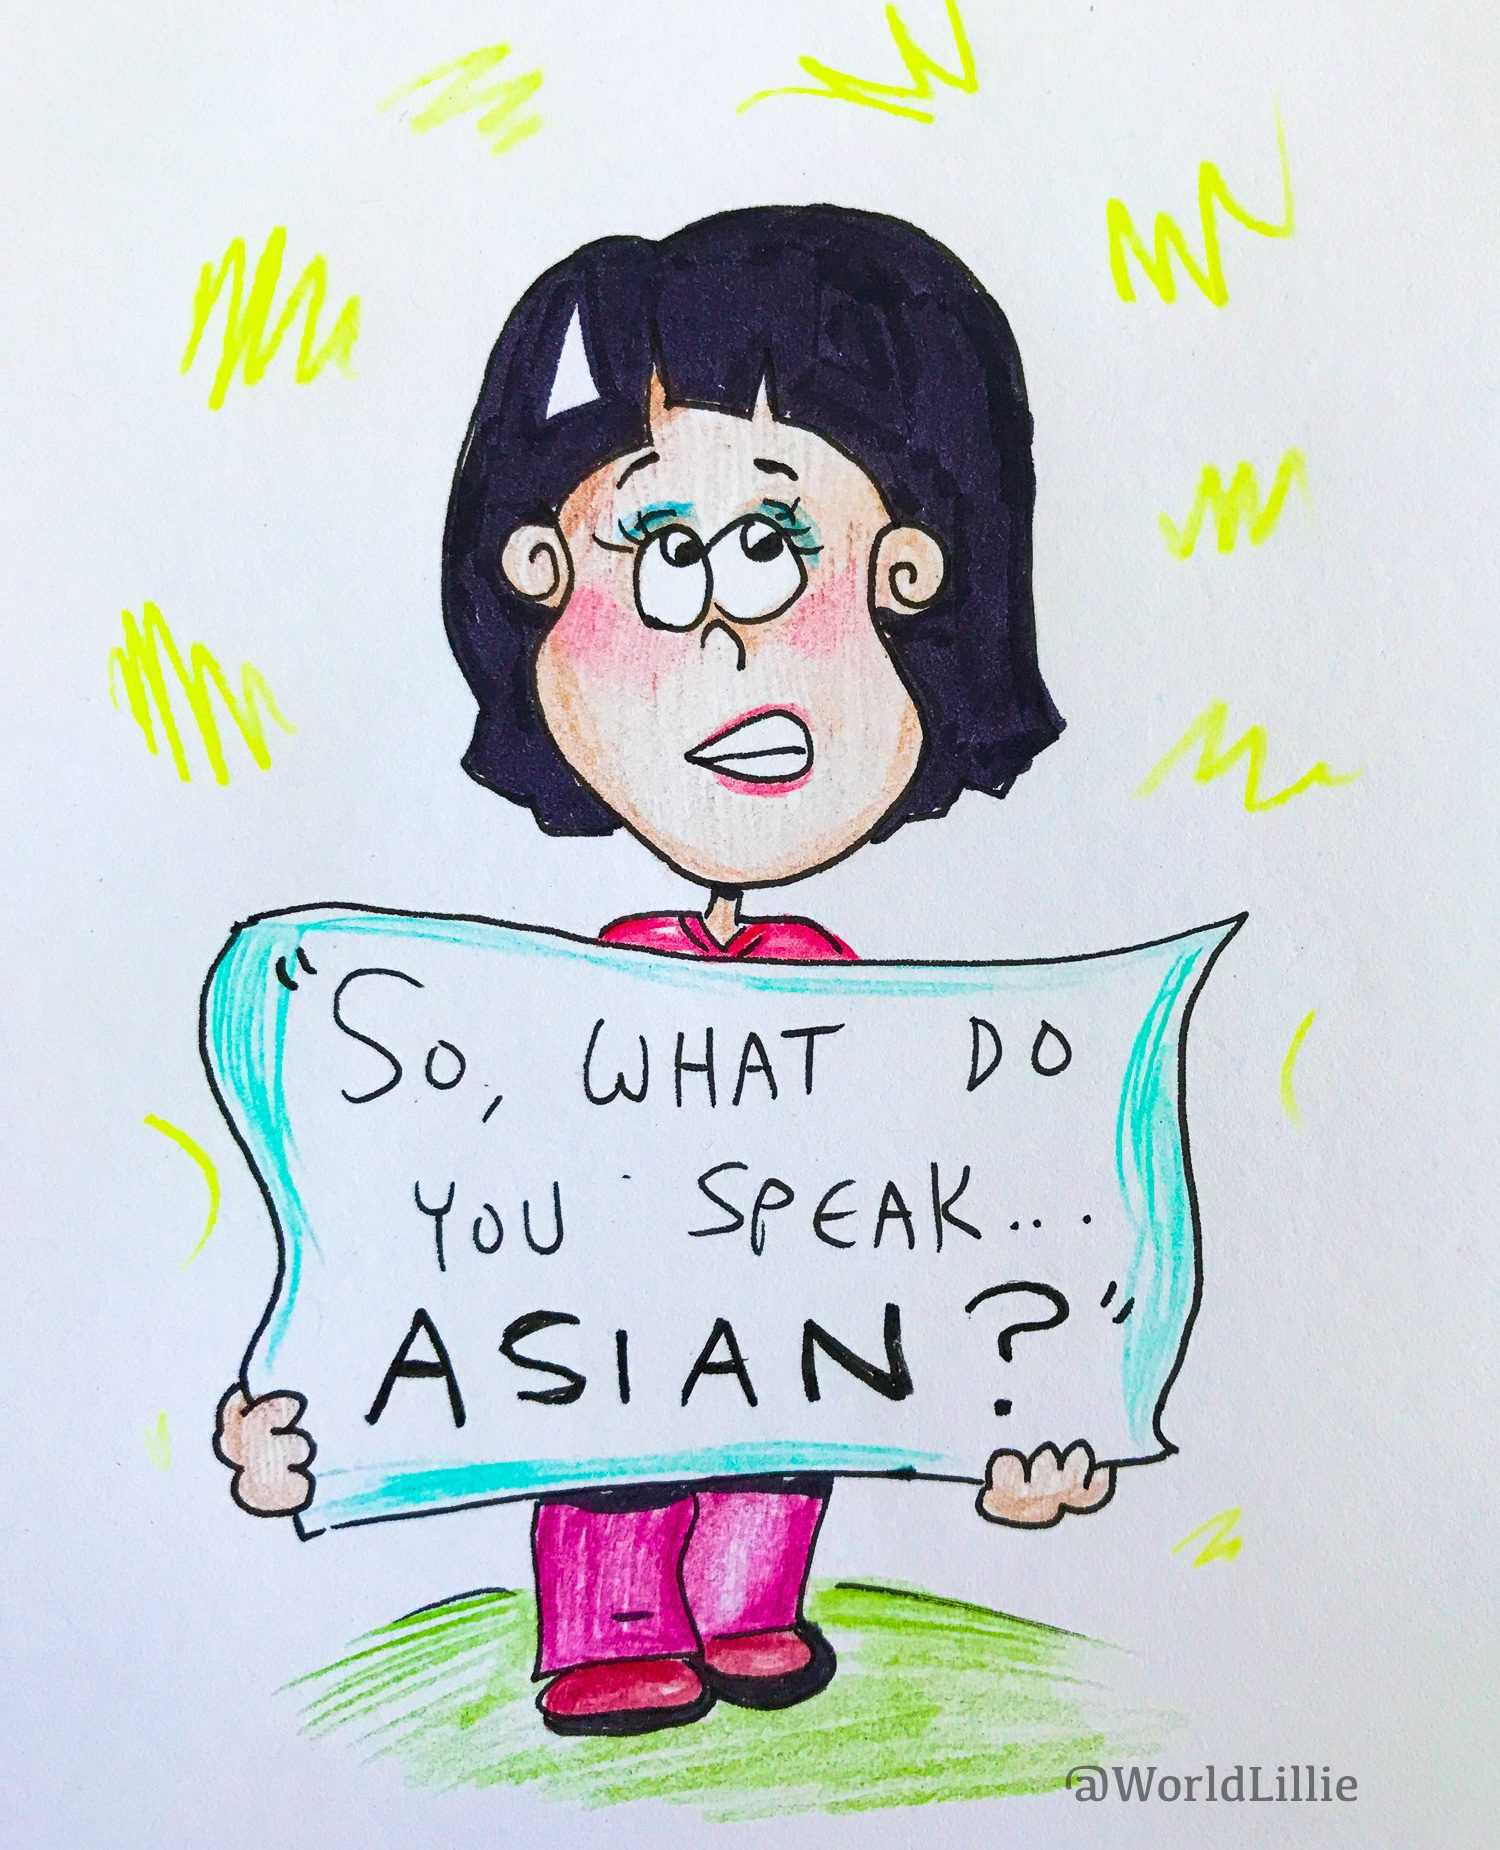 Microaggression: Do you speak Asian?